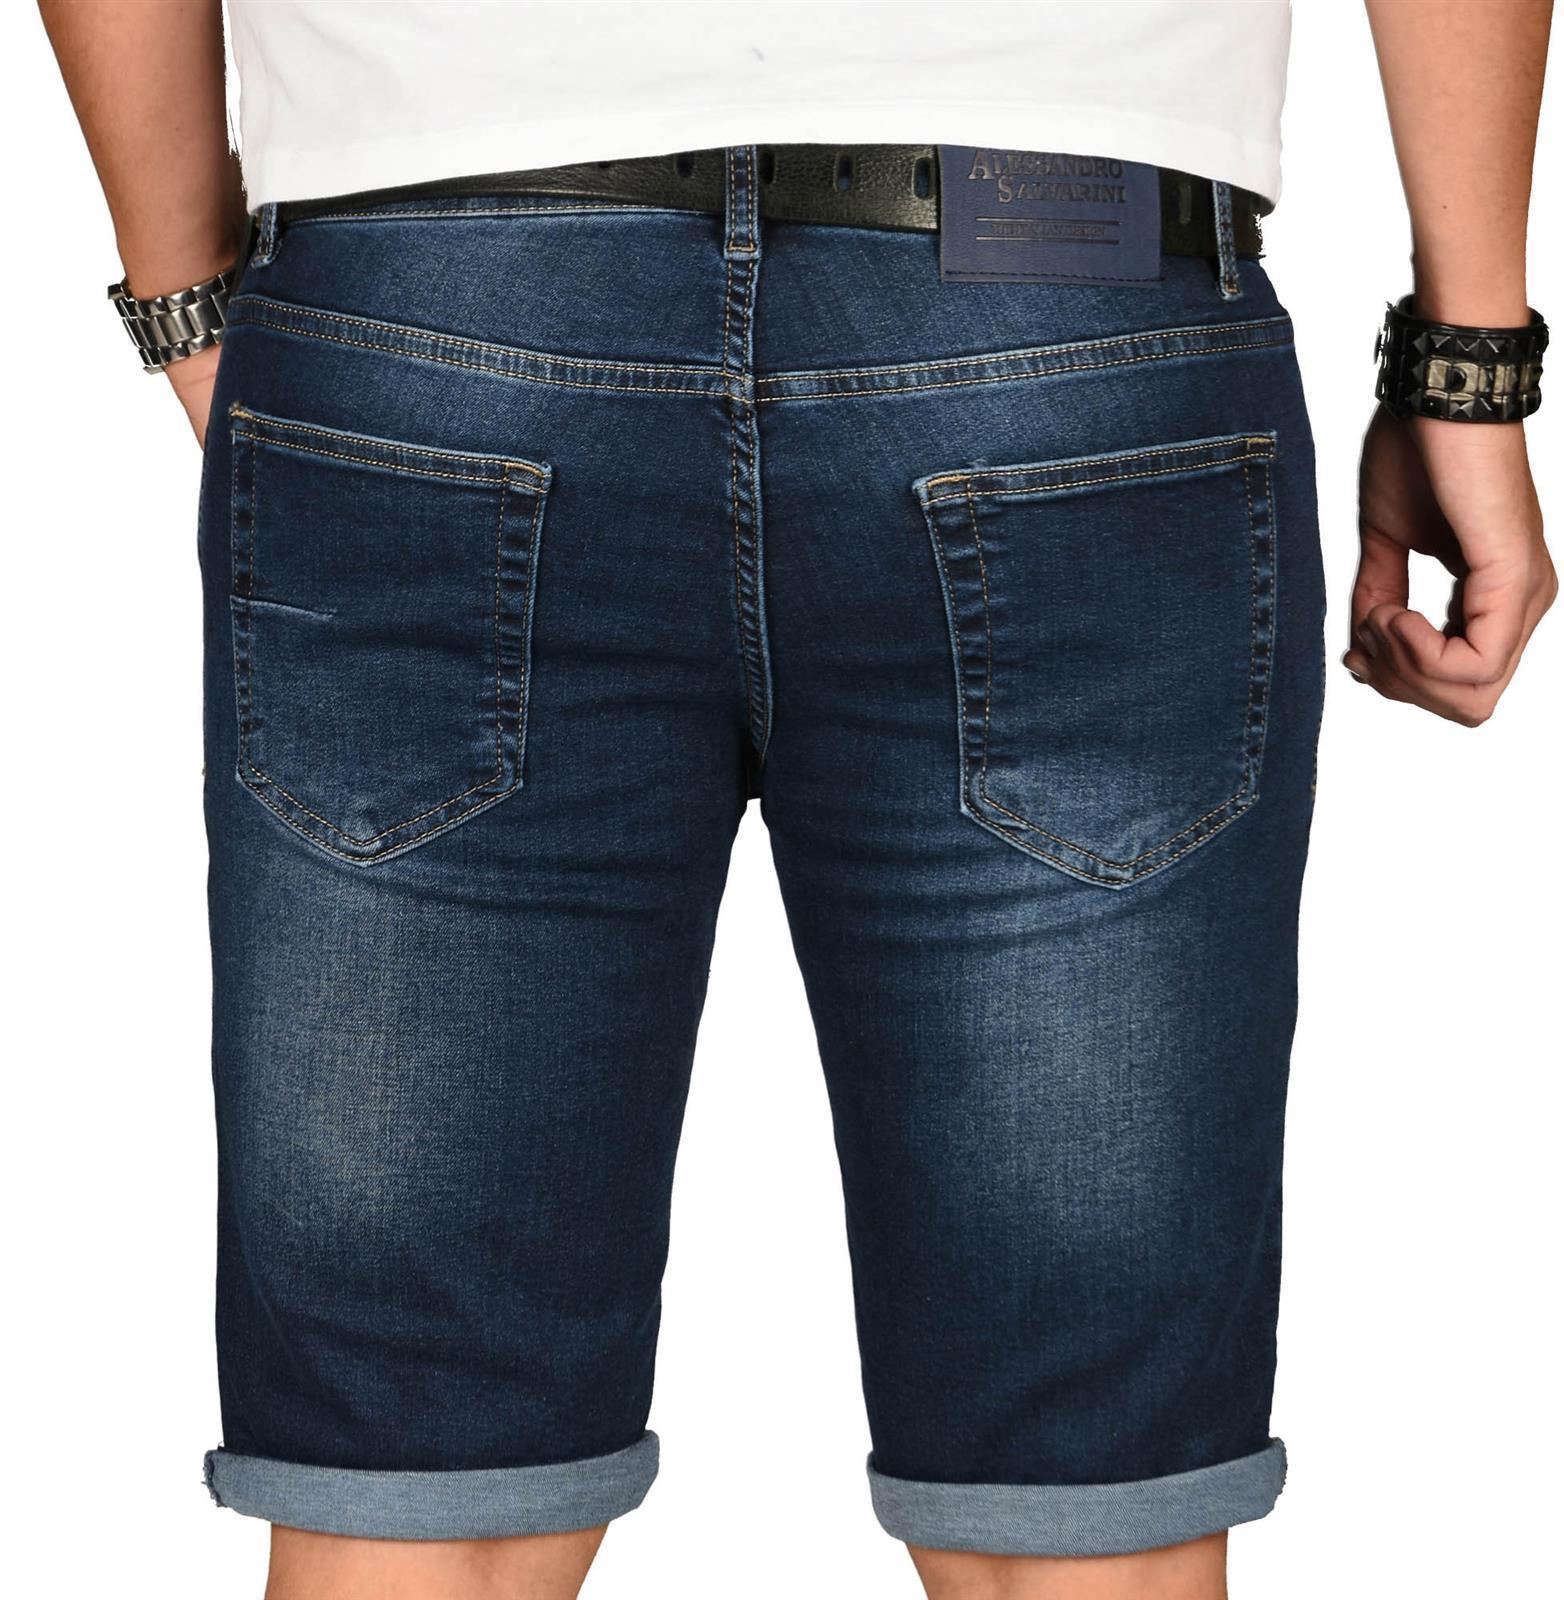 A-Salvarini-Herren-Designer-Jeans-Short-kurze-Hose-Slim-Sommer-Shorts-Washed Indexbild 37